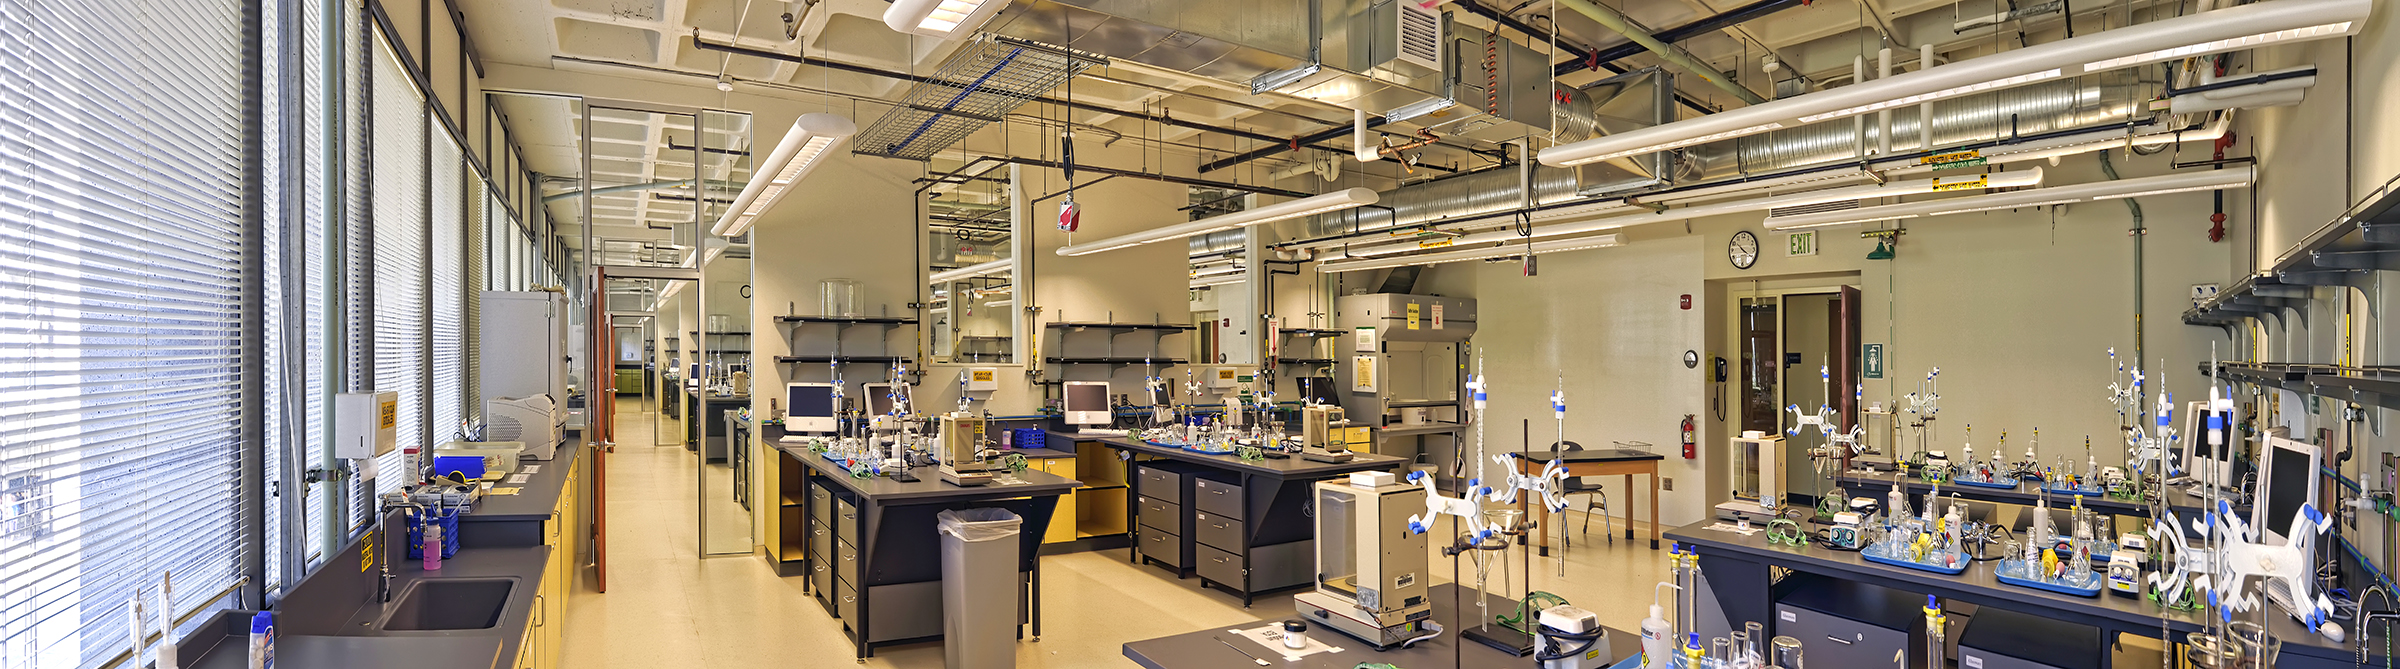 University of Oregon General Chemistry Teaching Labs